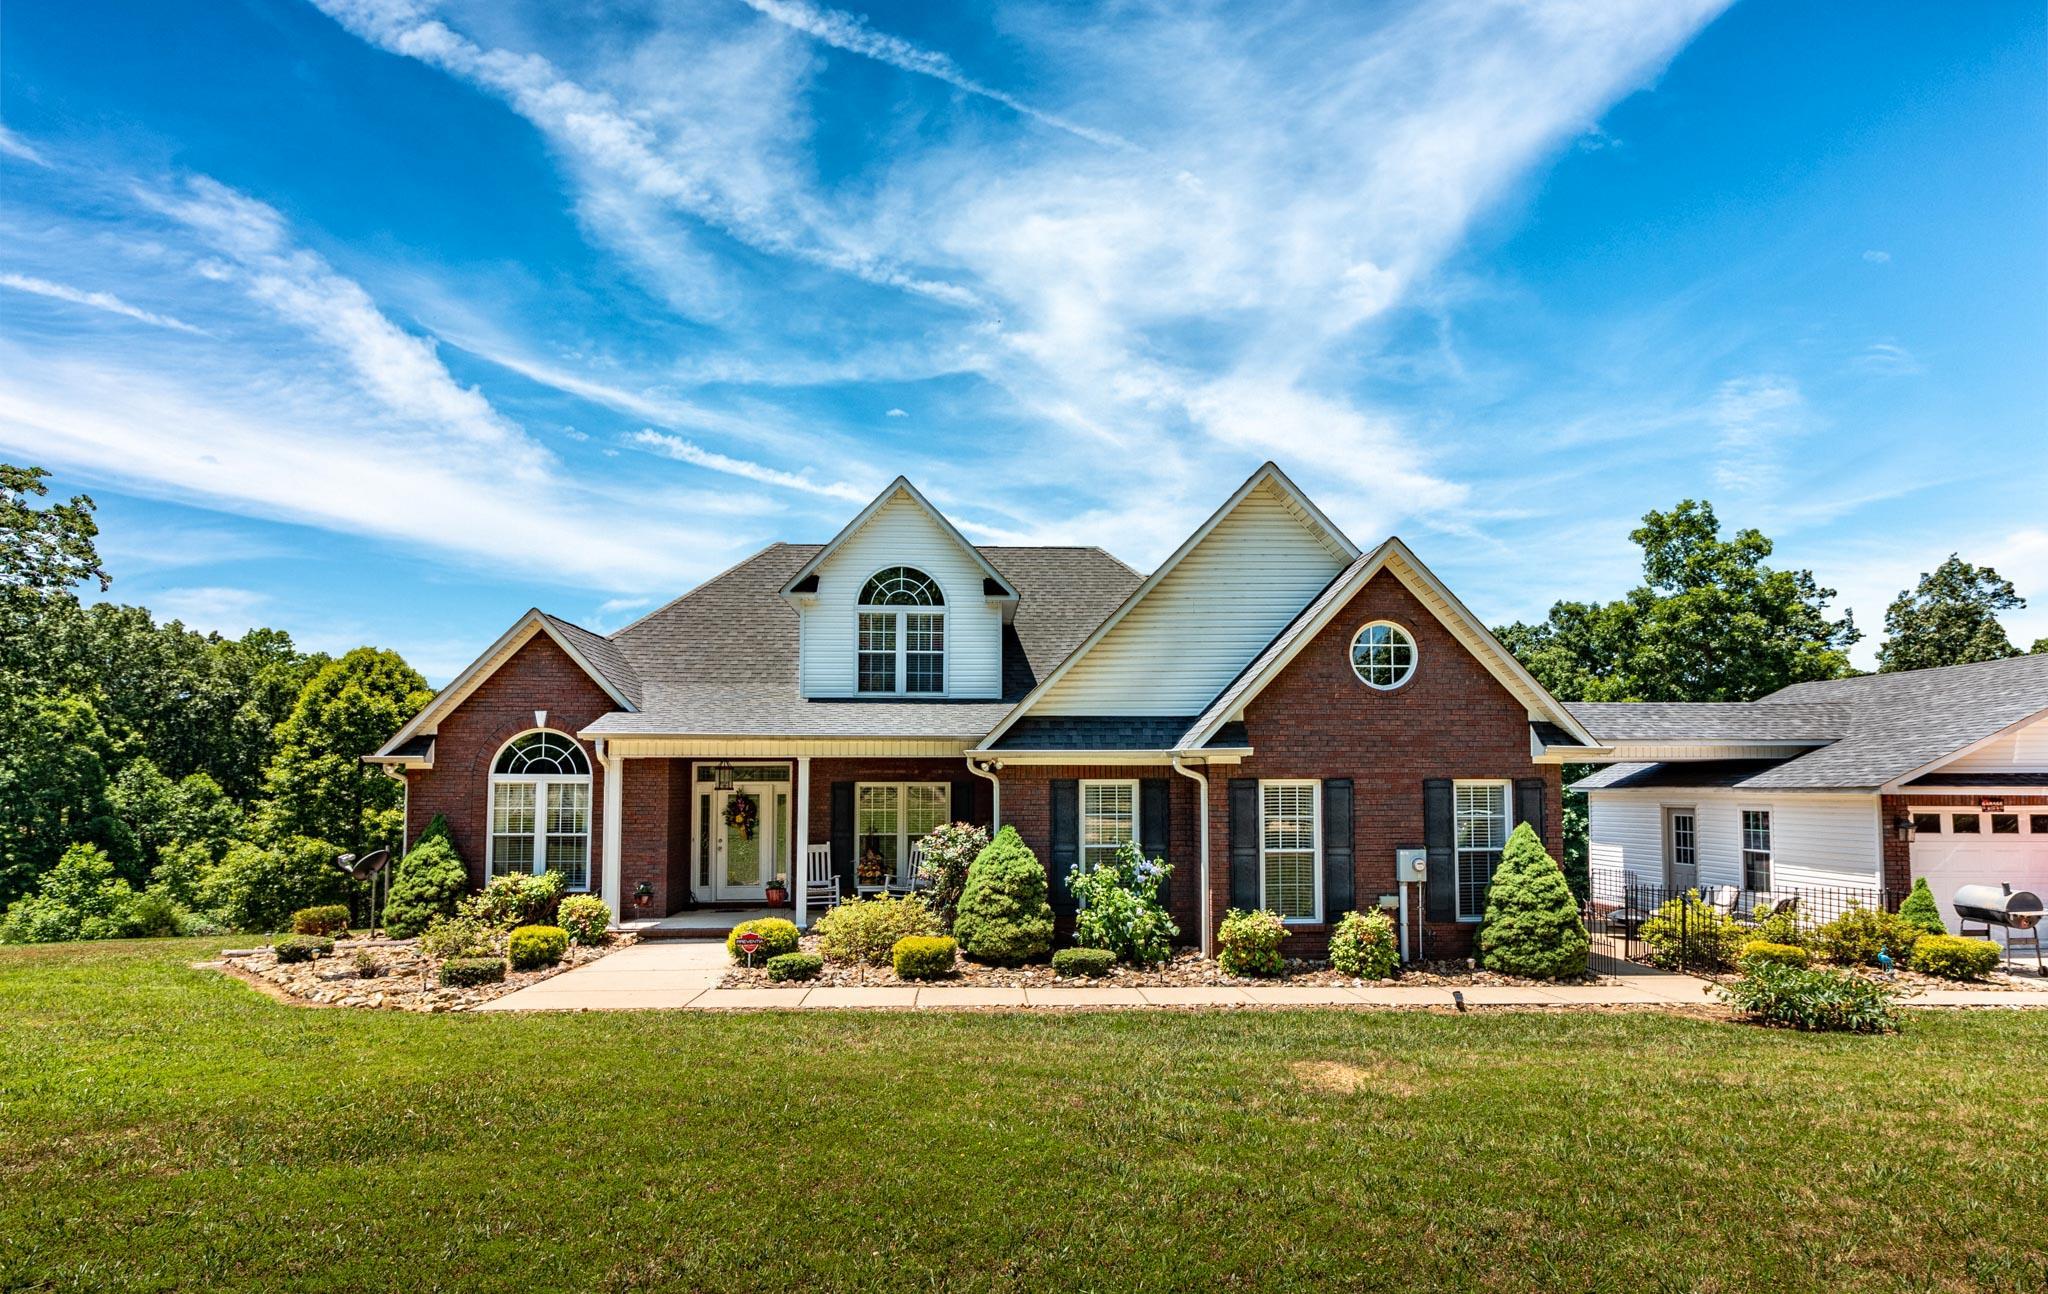 242 James Zimmerman Rd, Hampshire, TN 38461 - Hampshire, TN real estate listing